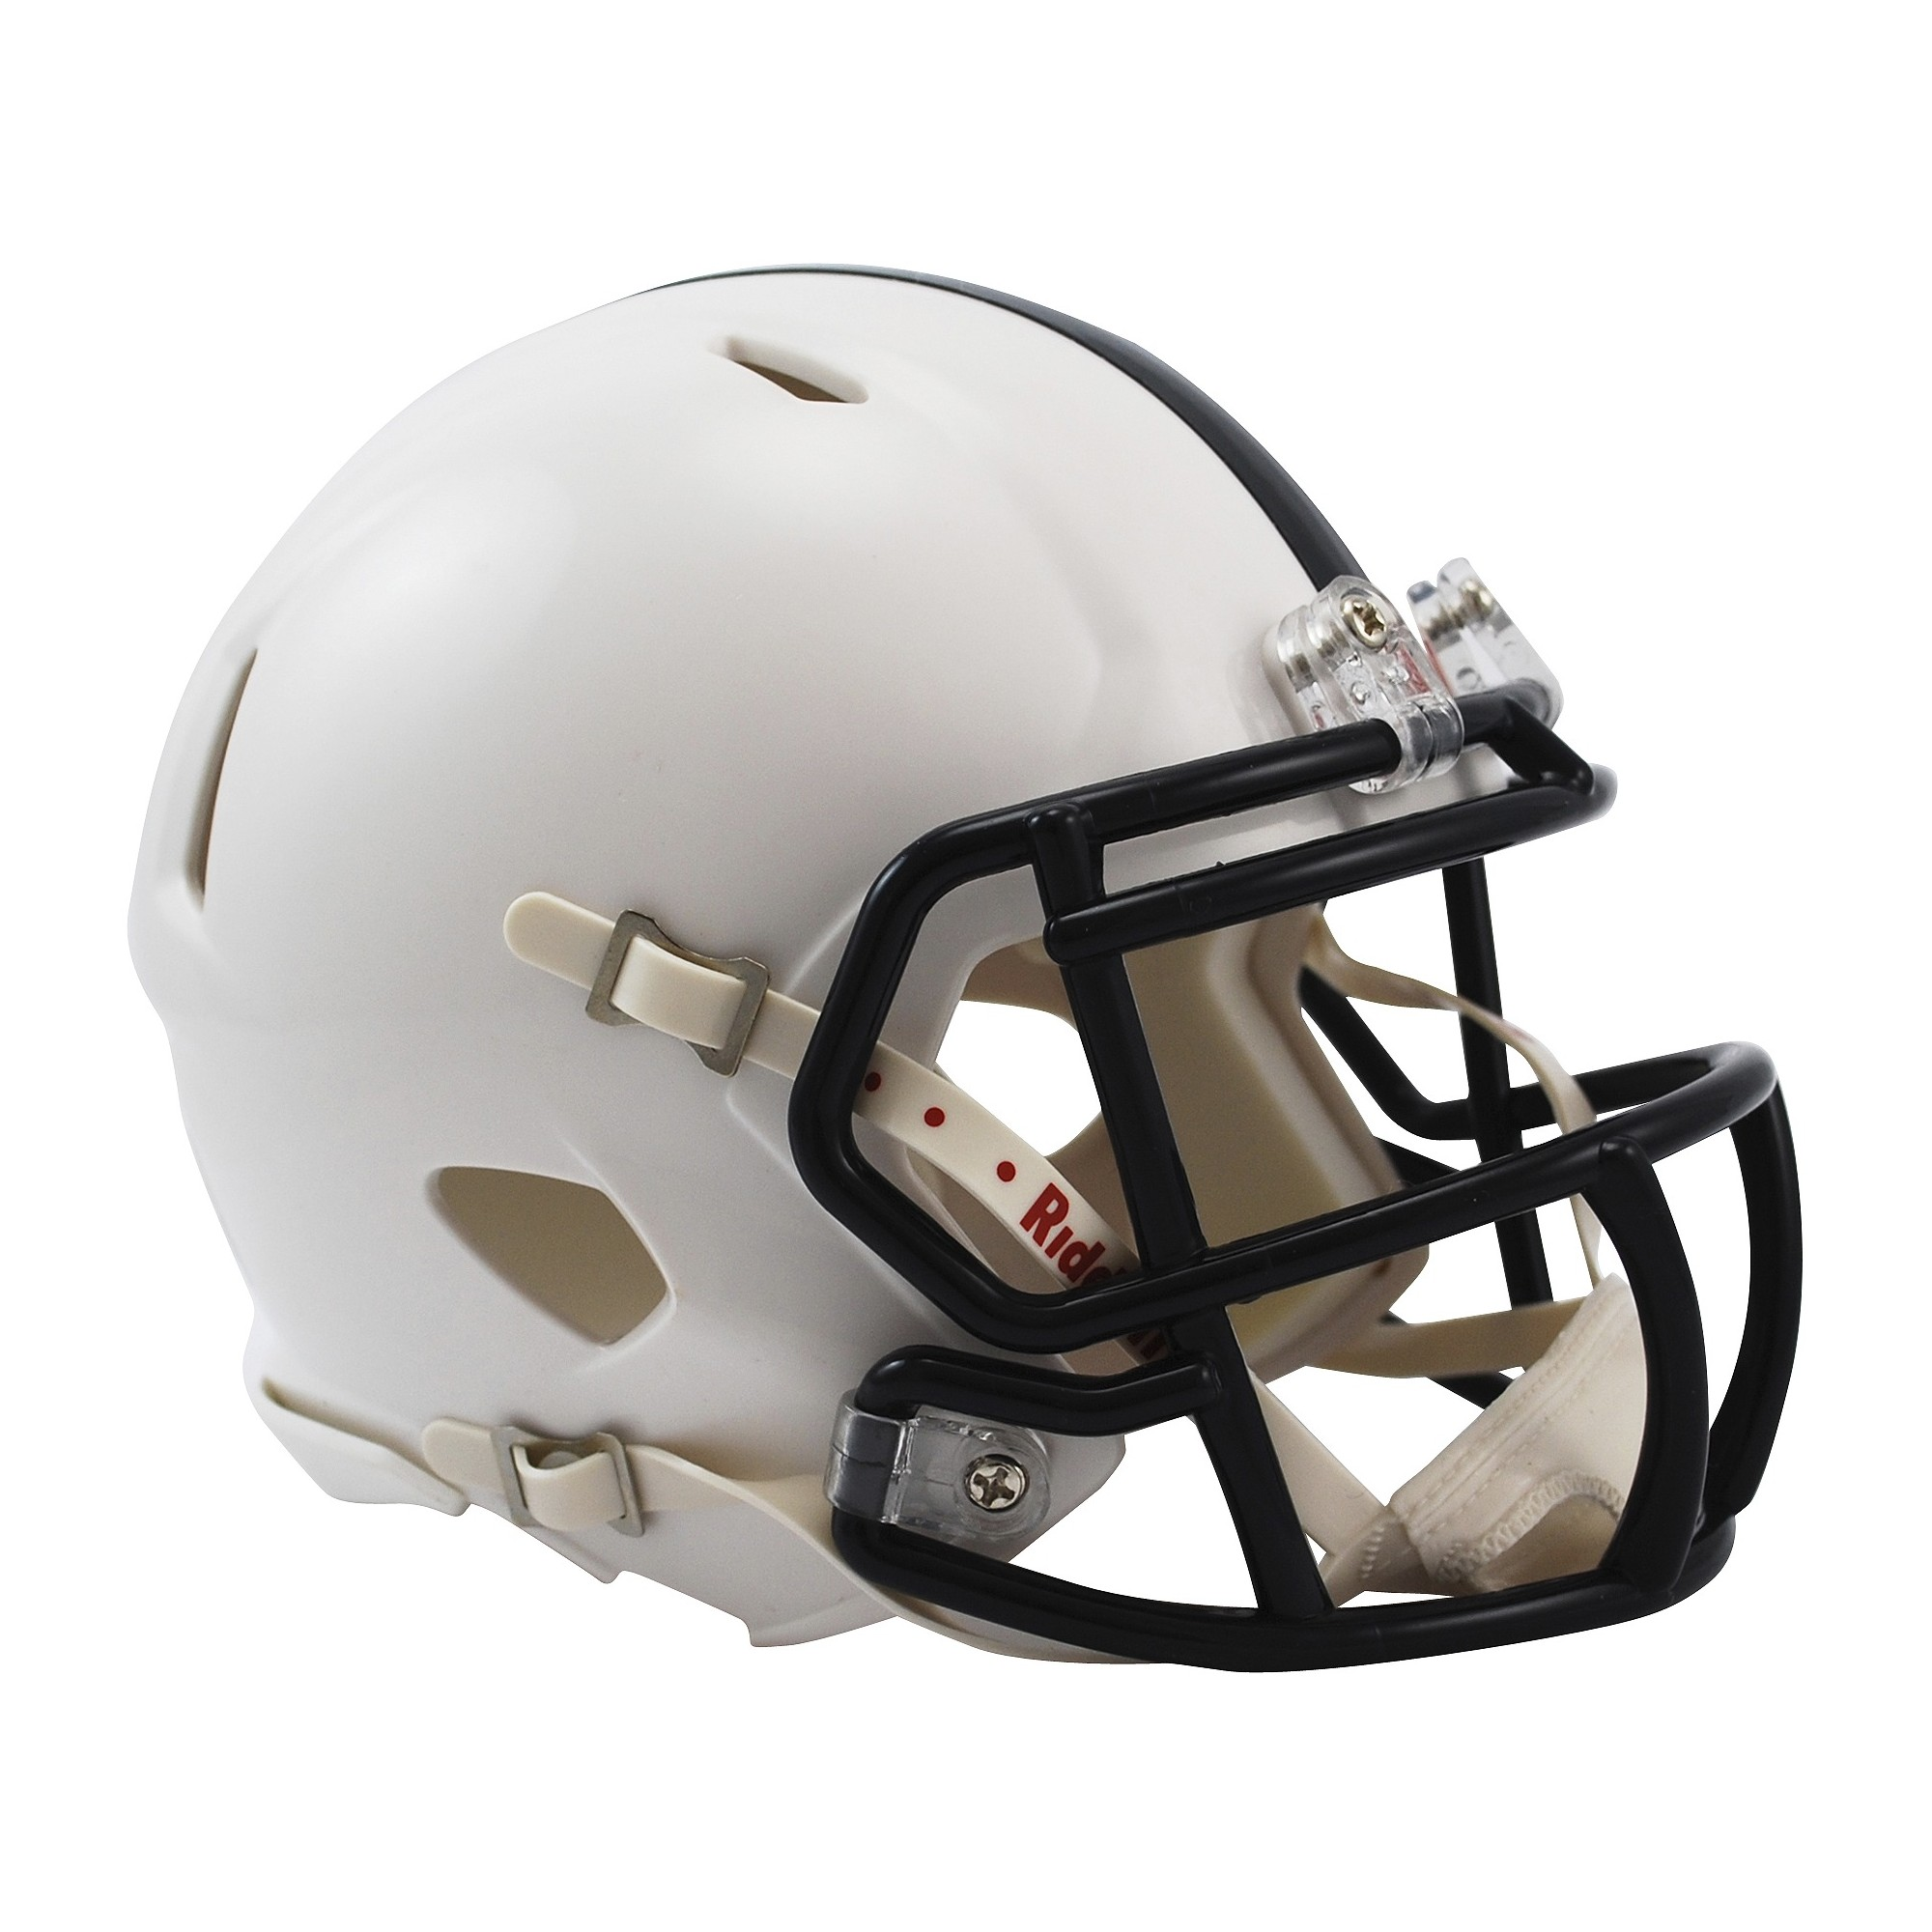 8a553bee NCAA Penn State Nittany Lions Riddell sylvania Speed Mini Helmet ...